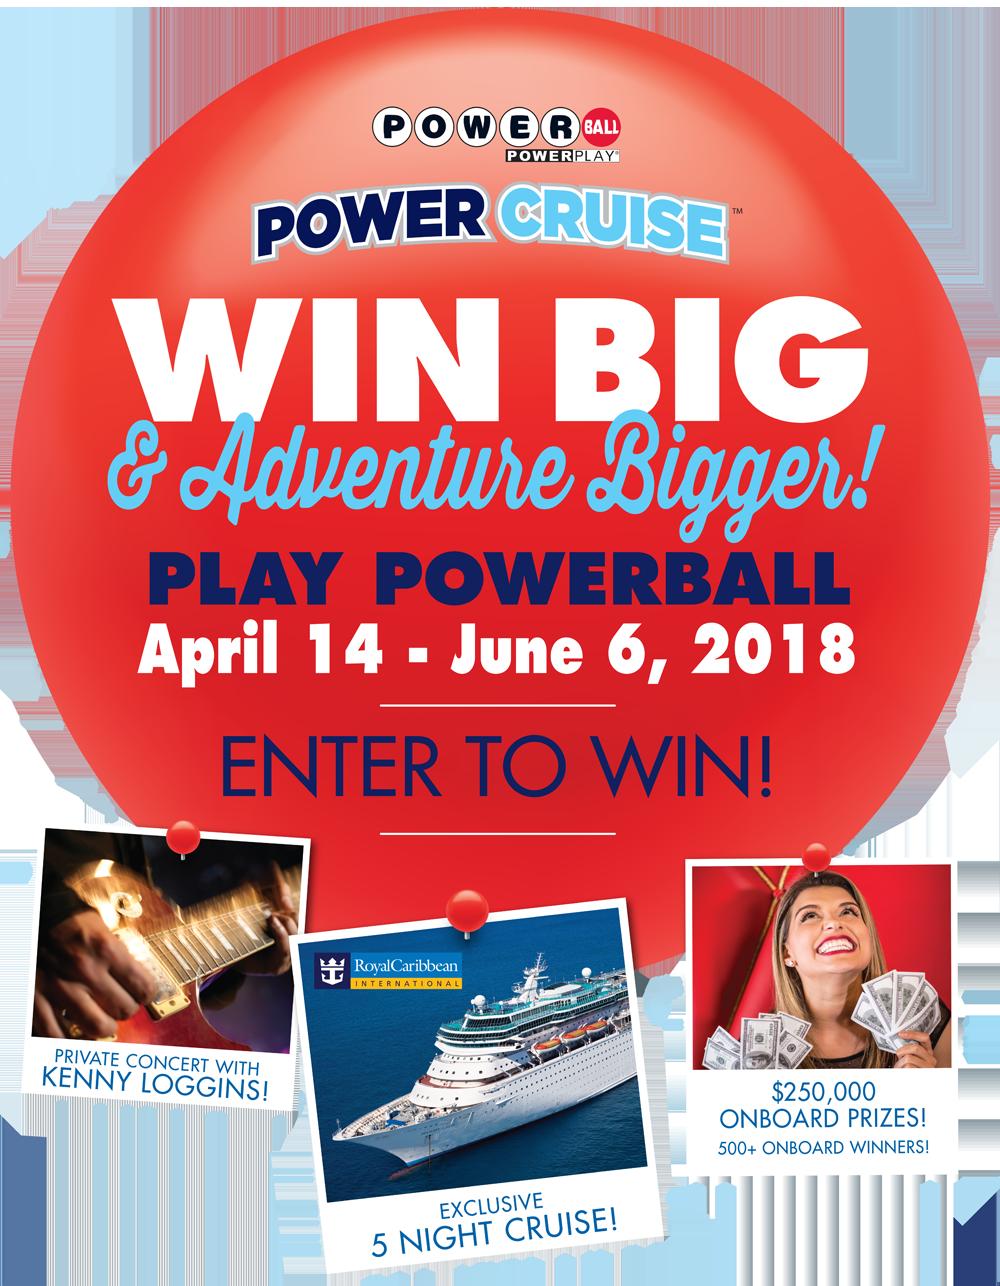 Powerball Power Cruise